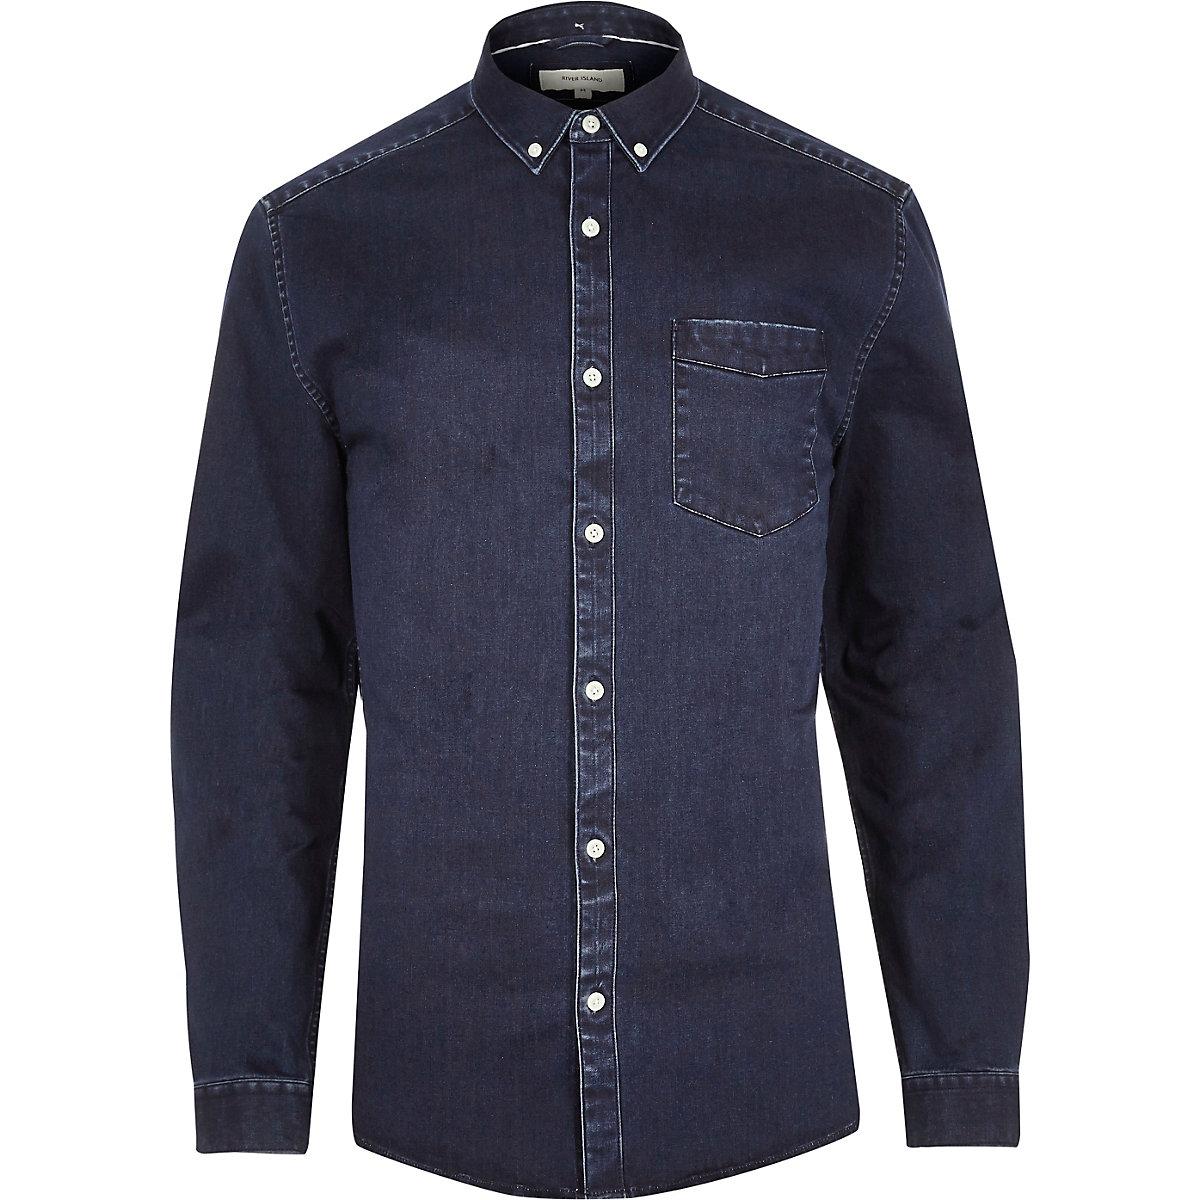 Indigo blue muscle fit denim shirt